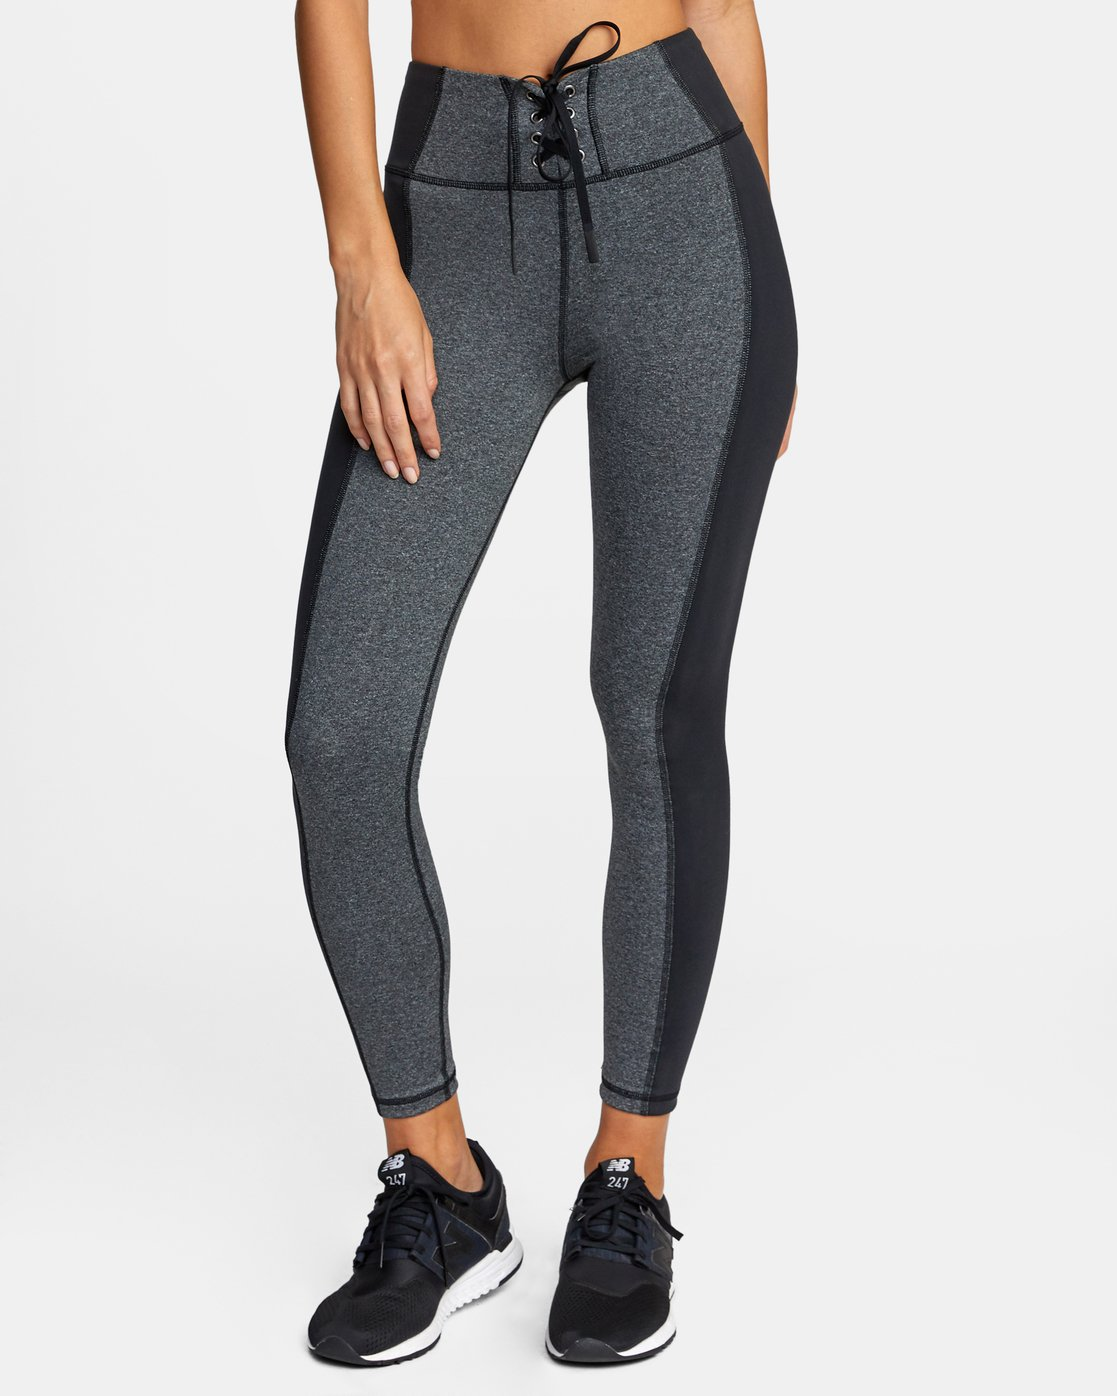 0 Everlast x RVCA Lace Up - High Waist Sports Leggings for Women Grey W4PTWDRVP1 RVCA